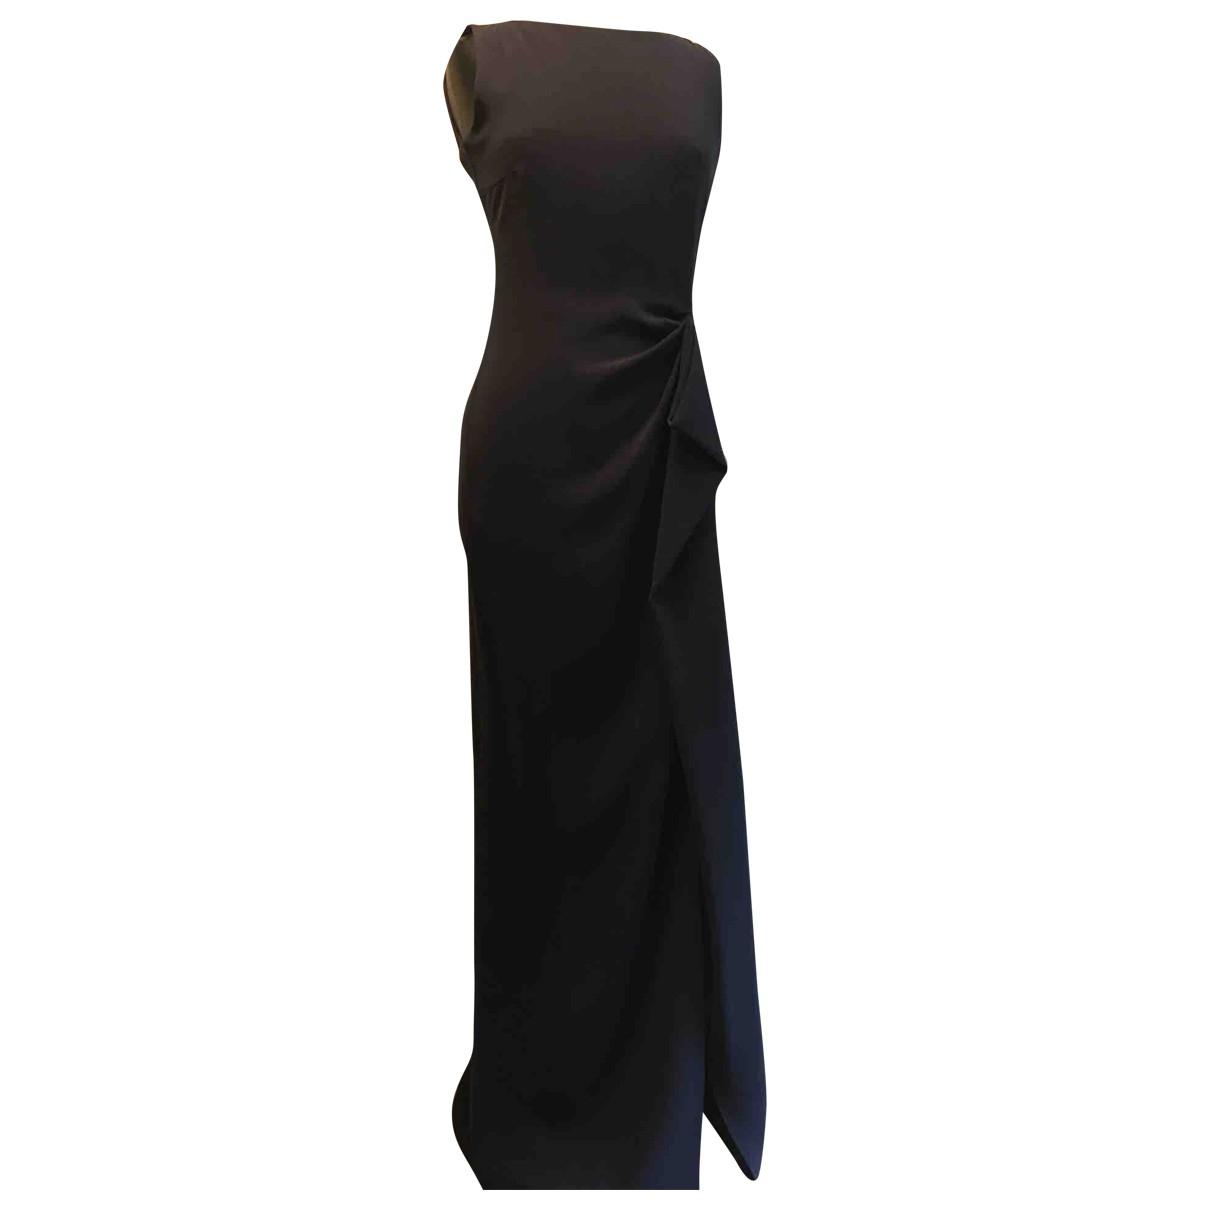 Carolina Herrera \N Blue dress for Women 4 UK